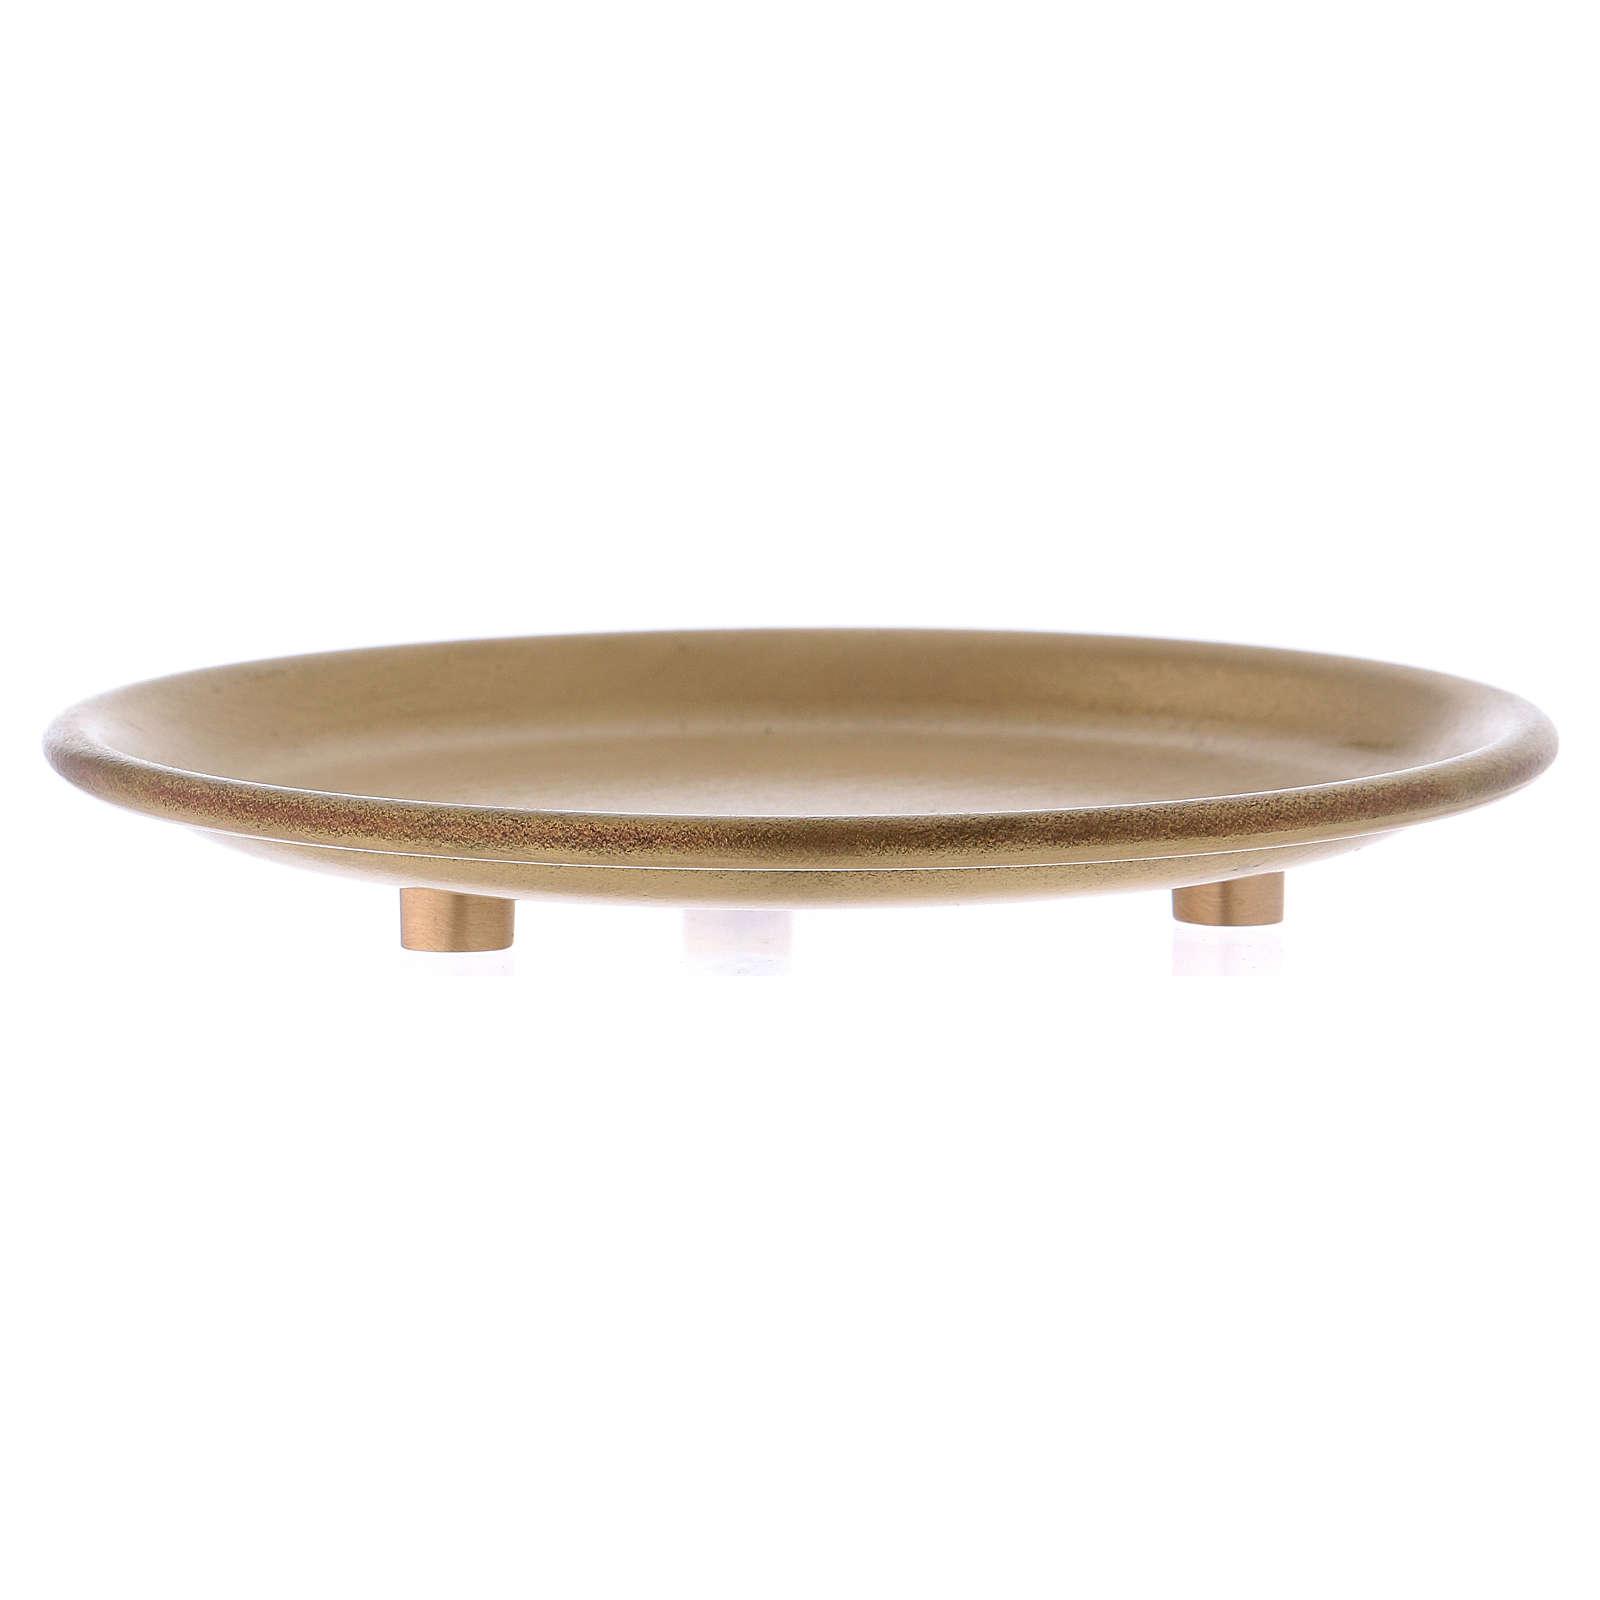 Plato portavela de latón dorado satinado diámetro d. 9 cm 3